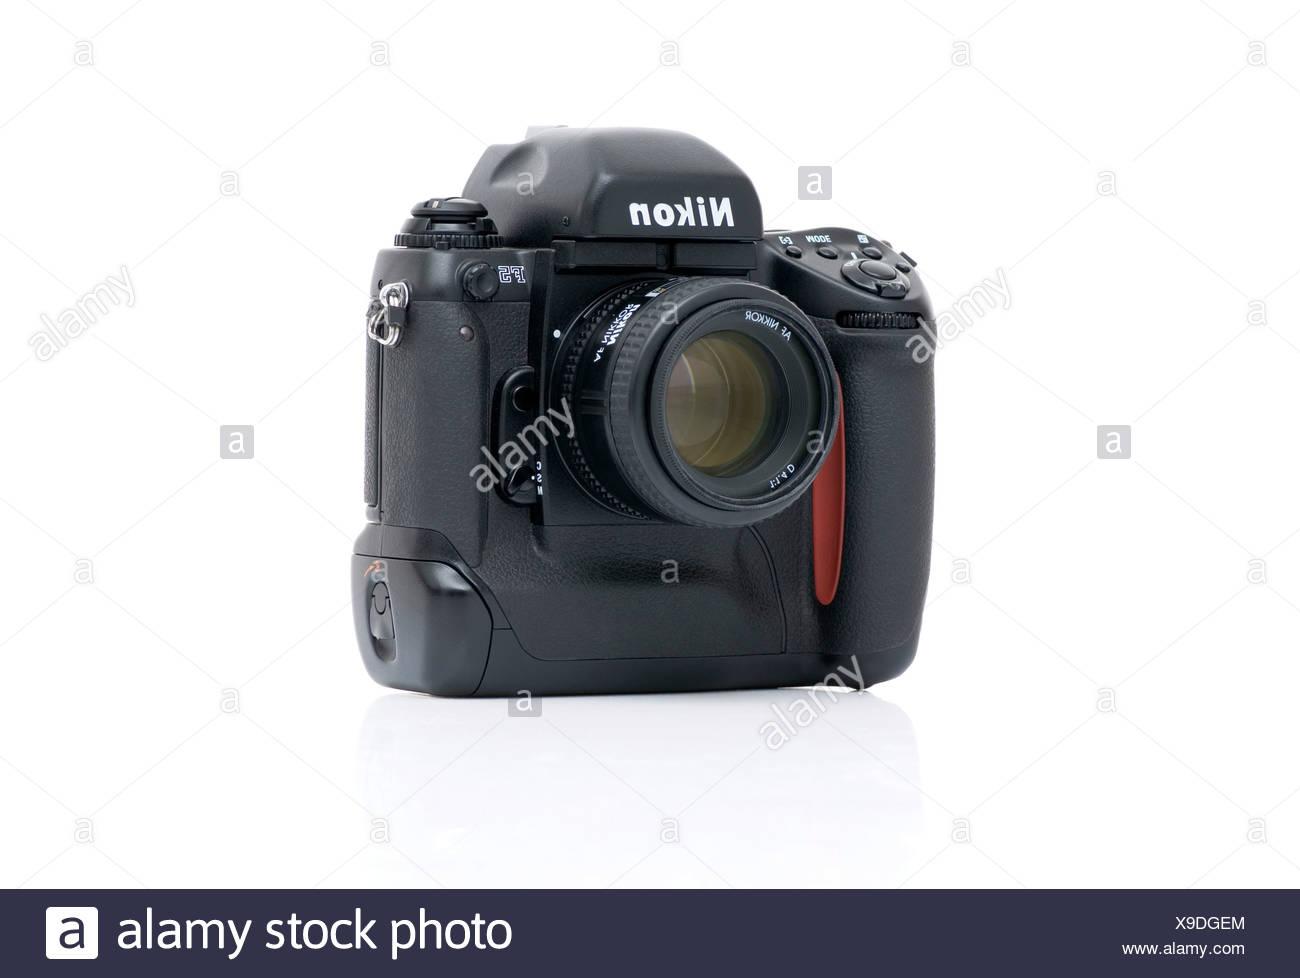 Nikon F5 professional reflex camera, 35mm format - Stock Image